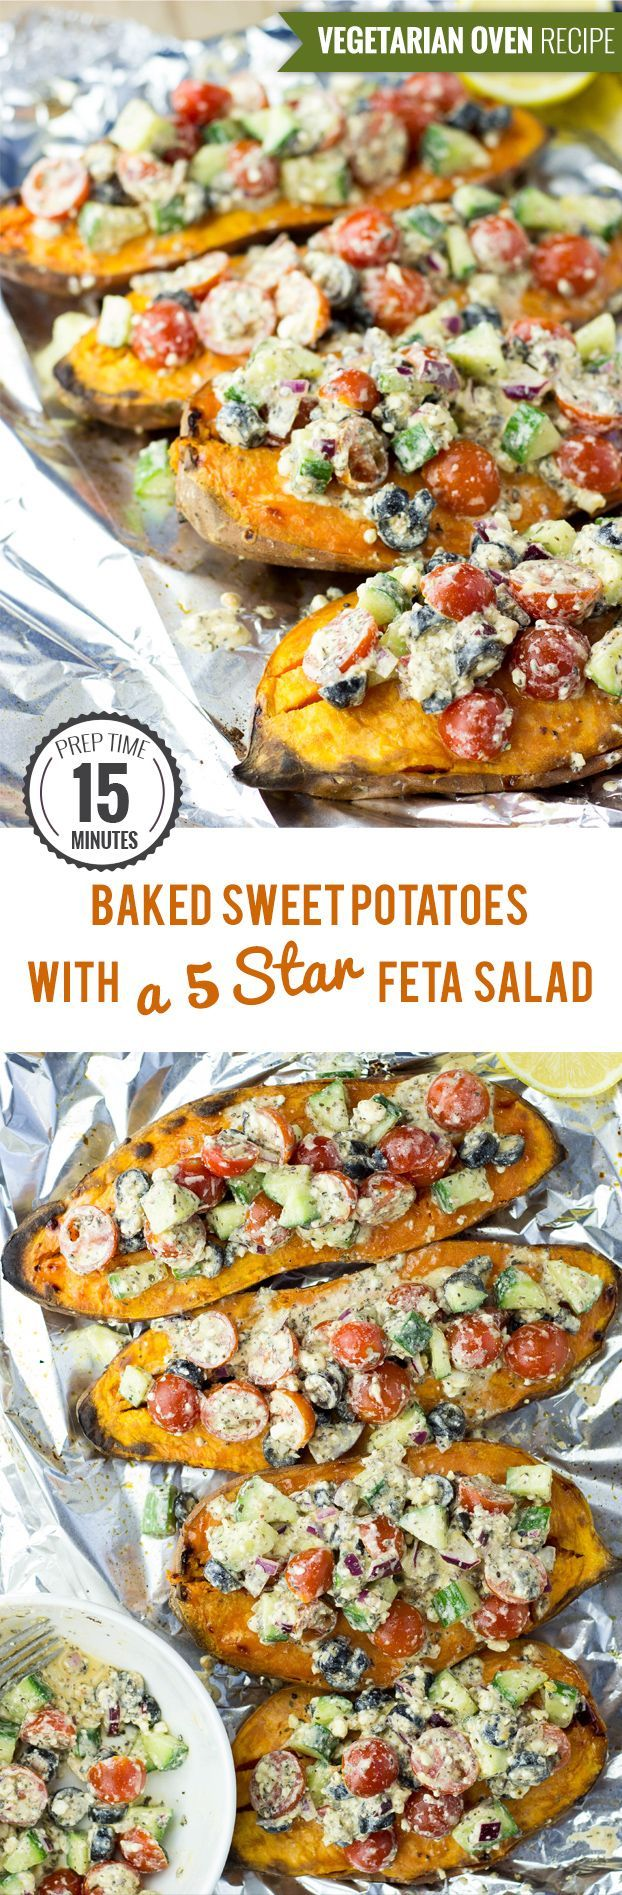 Baked Sweet Potatoes with a Five Star Feta Salad #sweetpotatoes #baked #feta   http://hurrythefoodup.com